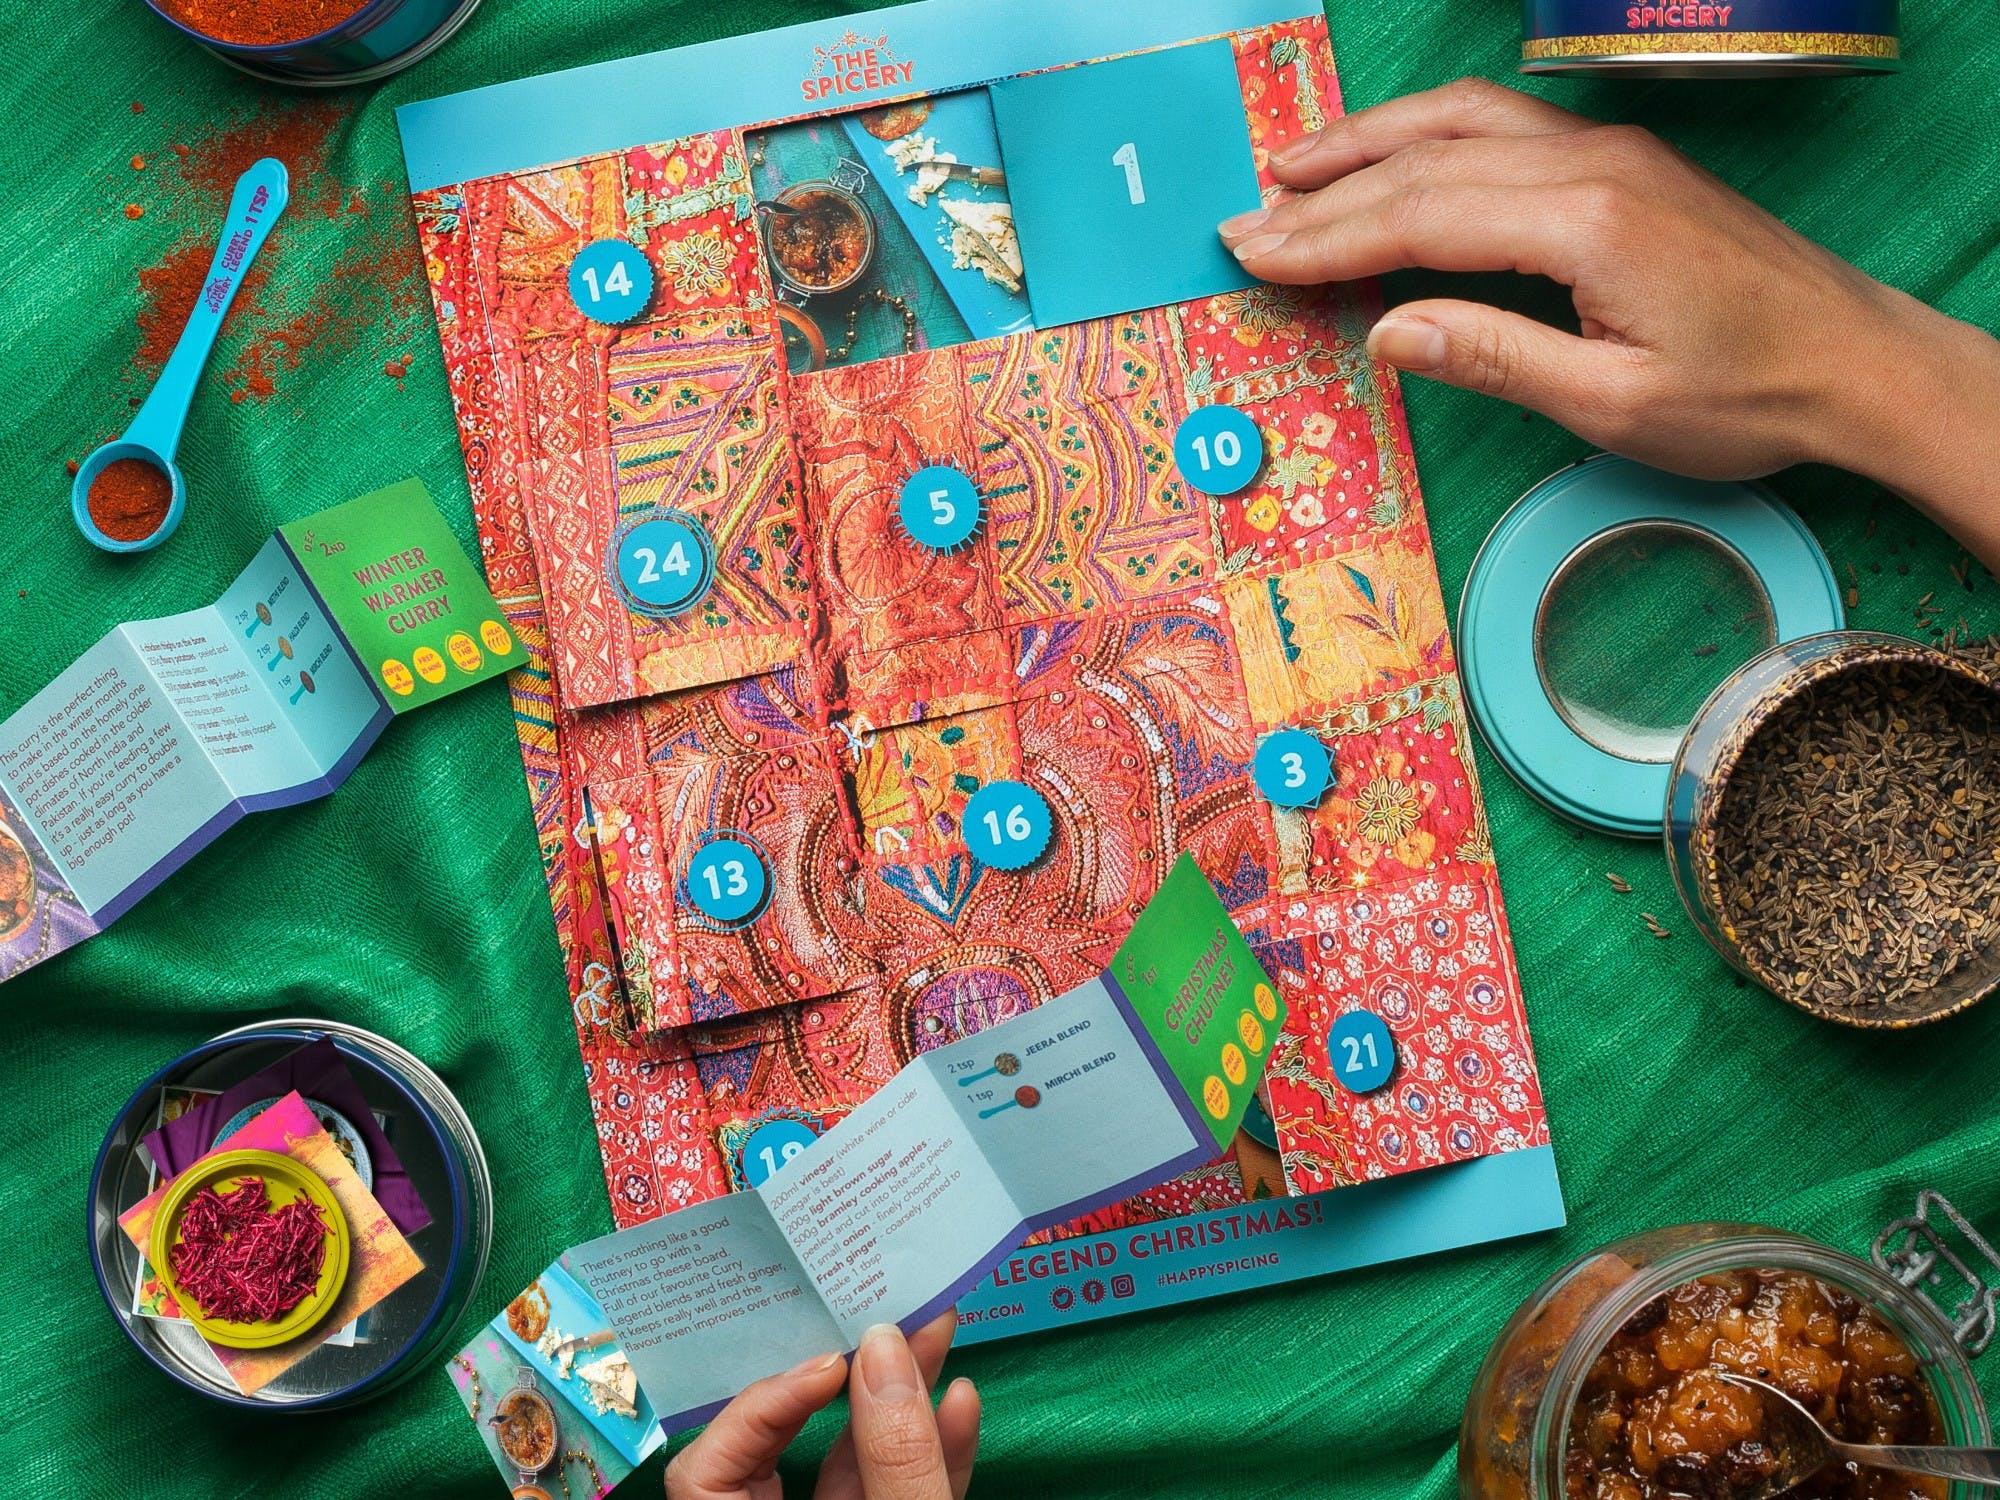 Curry Legend Advent Calendar - The Spicery